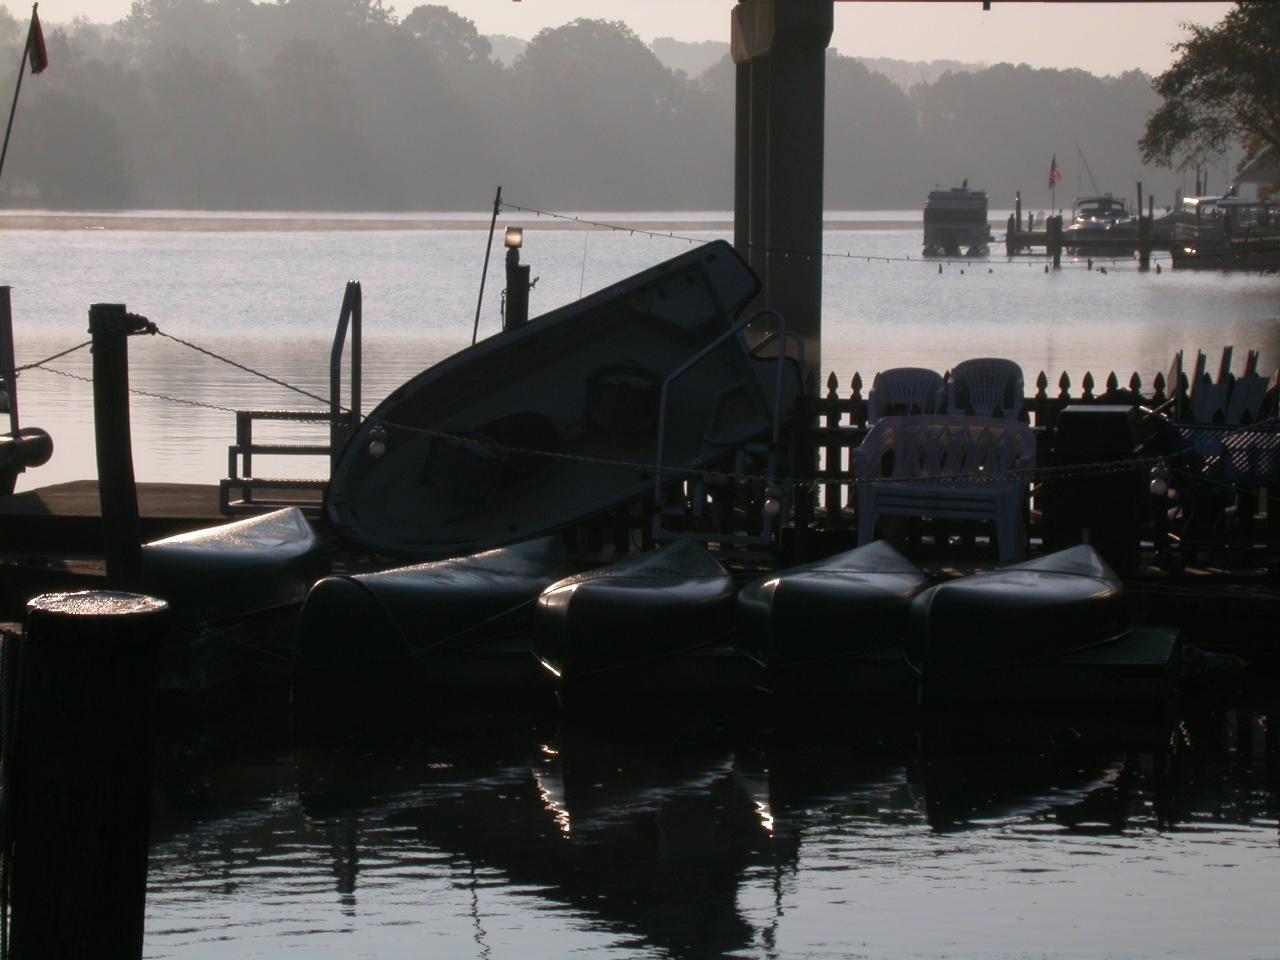 Boats on land, Boats, Green, Sail, Sea, HQ Photo